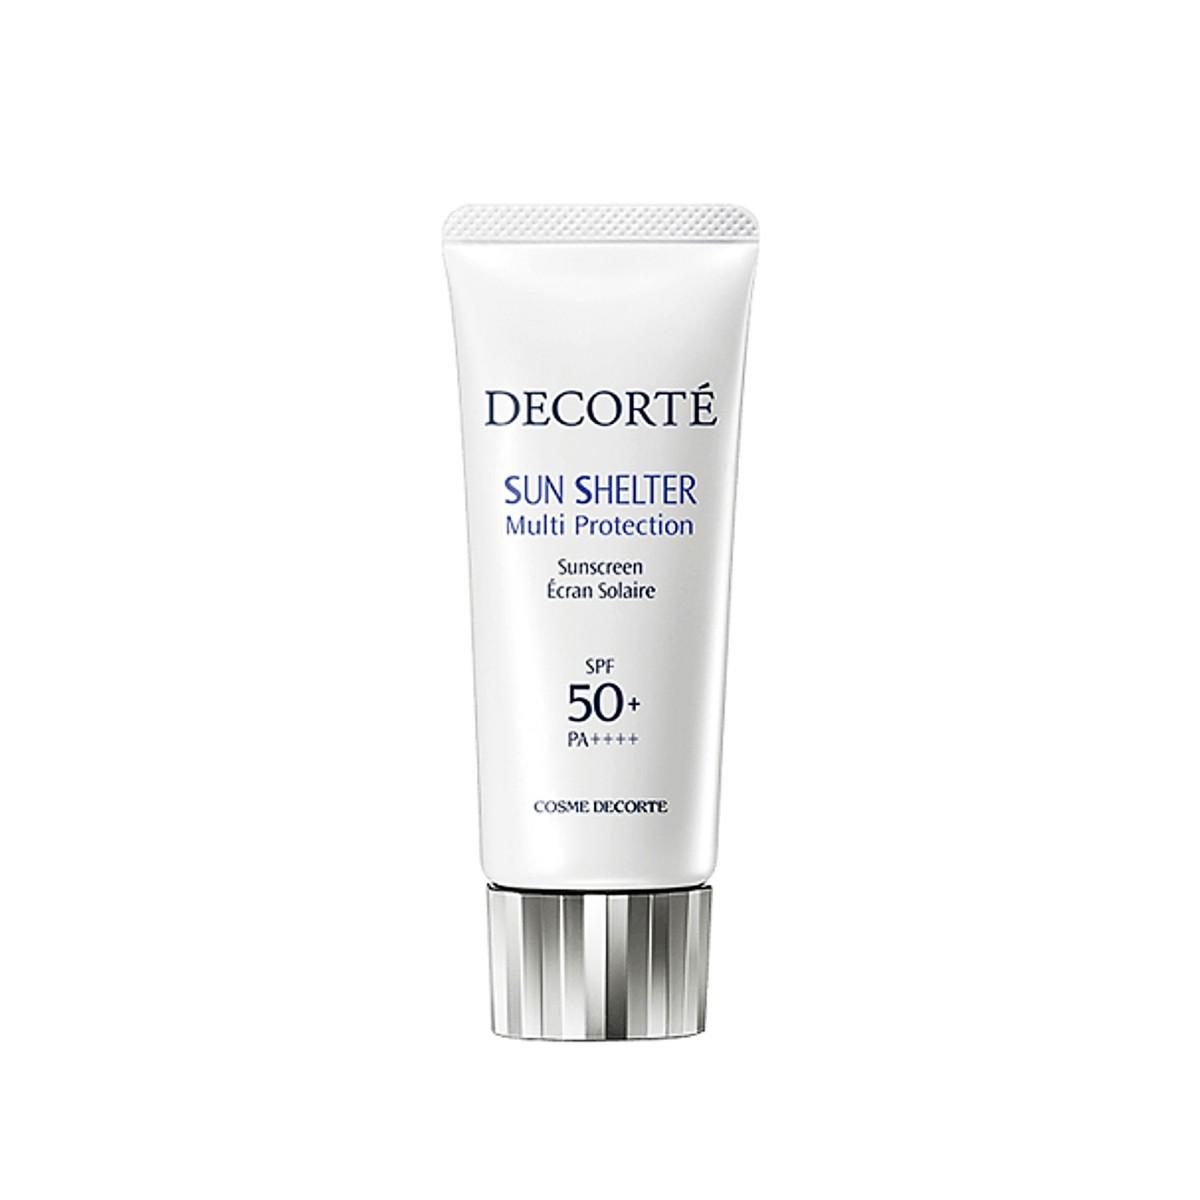 Cosme Decorte SUN SHELTER MULTI PROTECTION SPF50+ PA++++